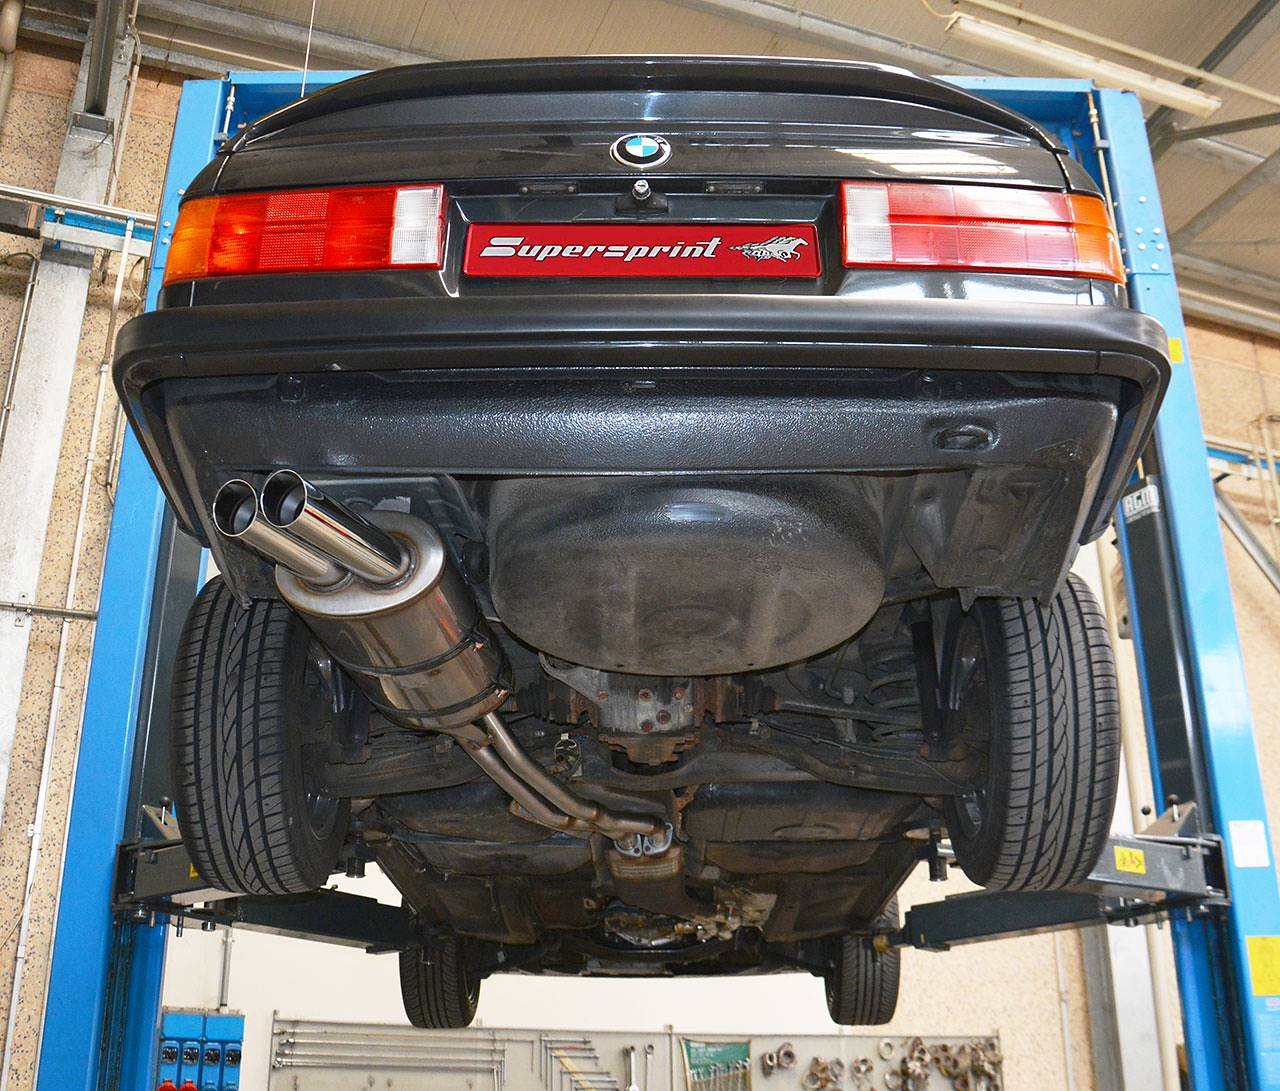 Sportauspuff Anlage Für BMW E30 320i, BMW E30 320i Kat